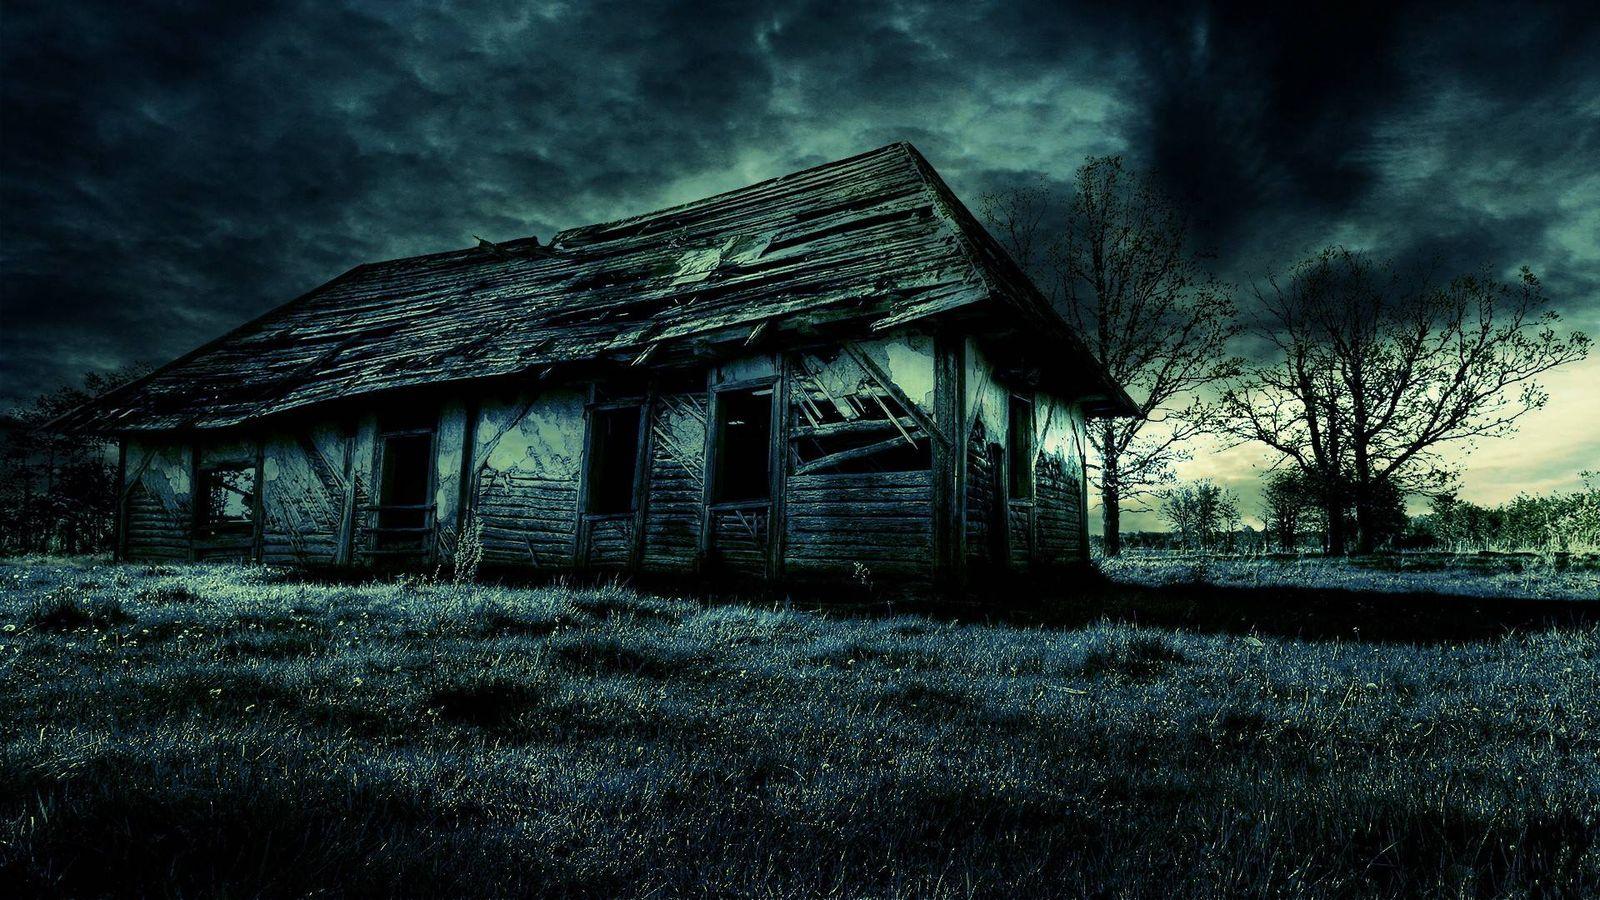 gothic-1080p-wallpaper_1_1600x900